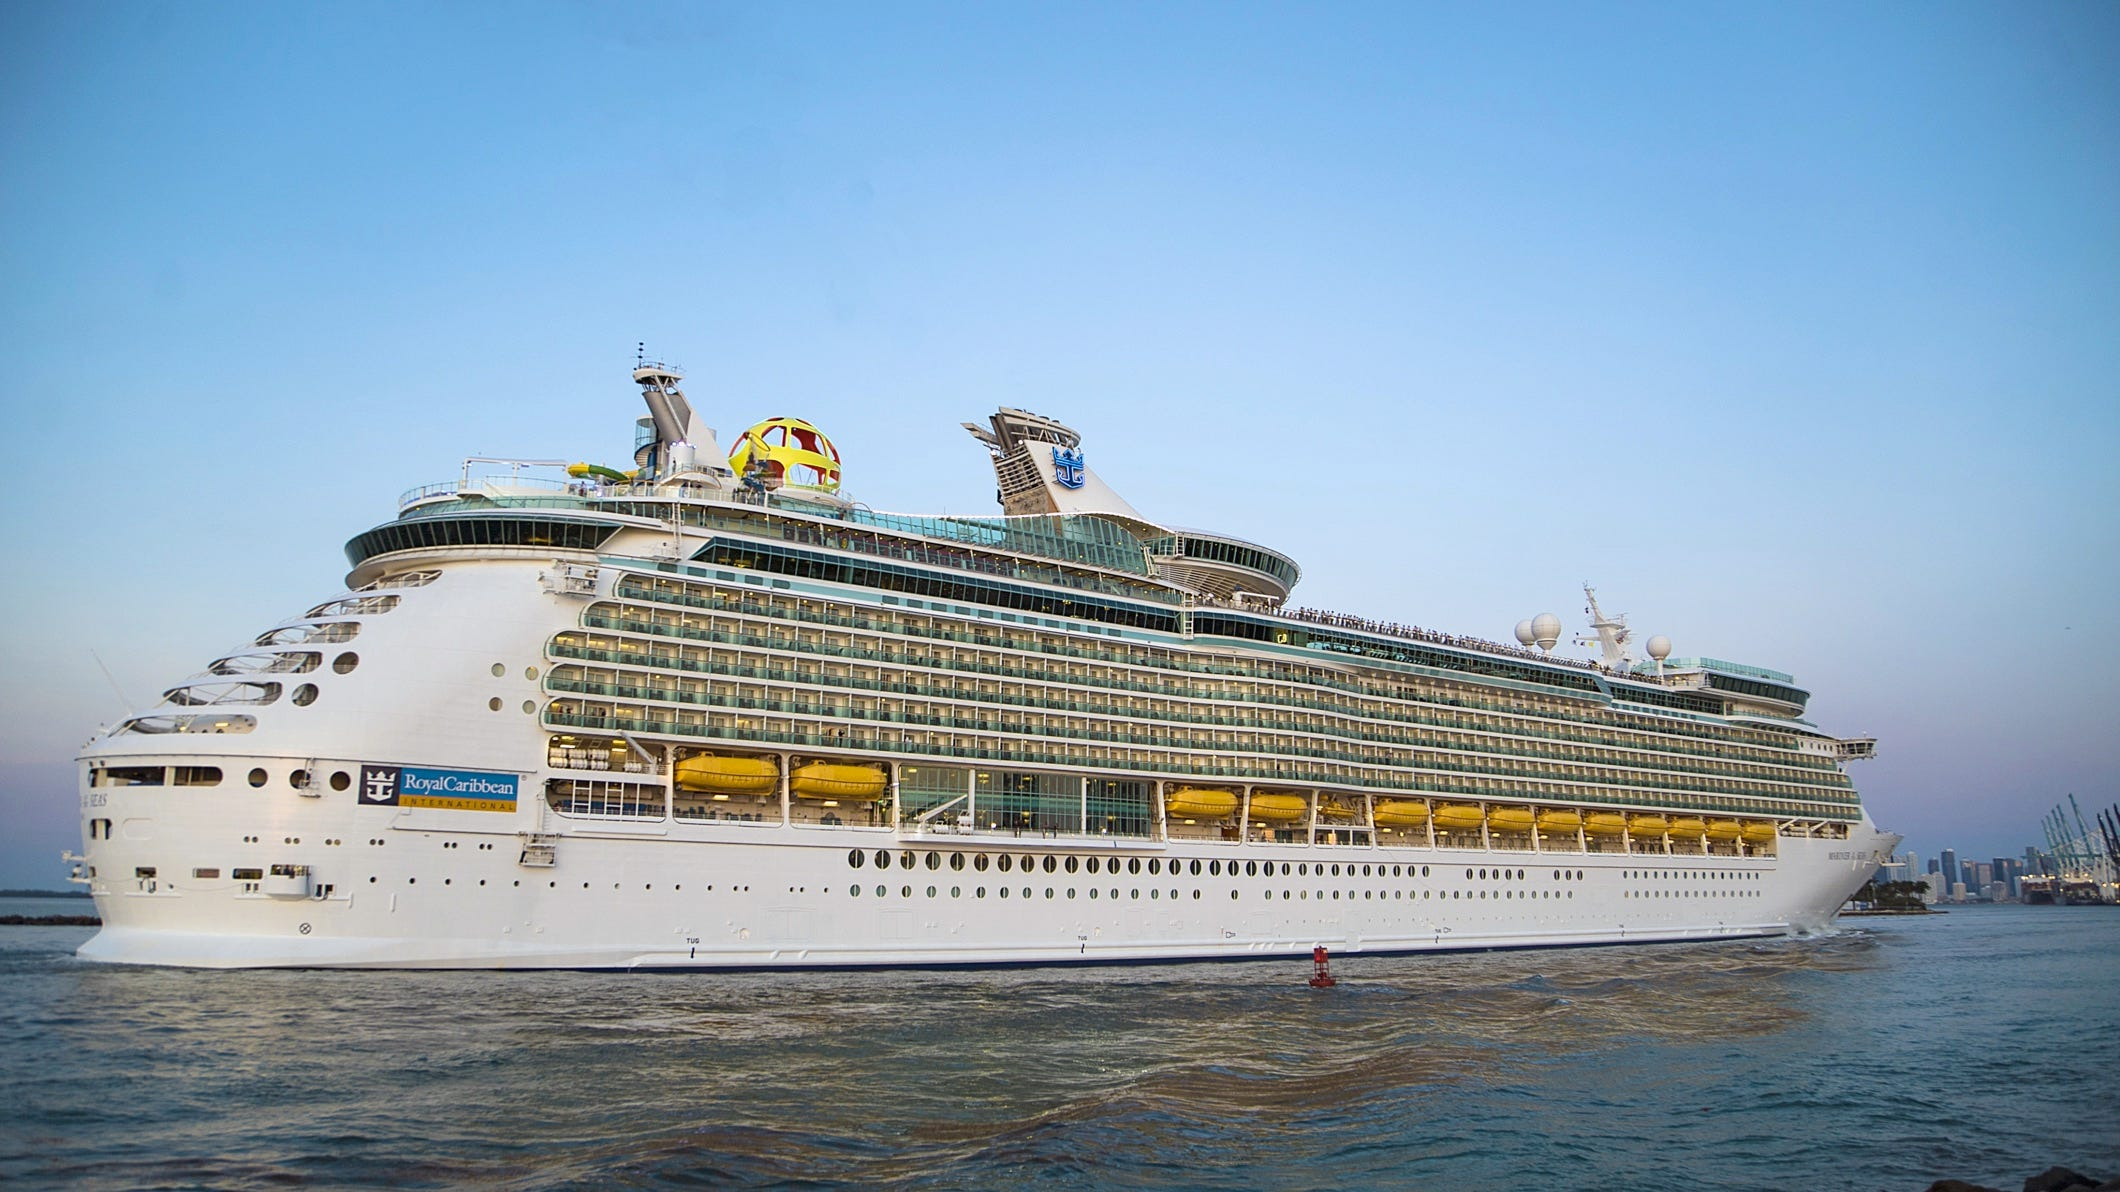 Royal Caribbeanu0027s revamped Mariner of the